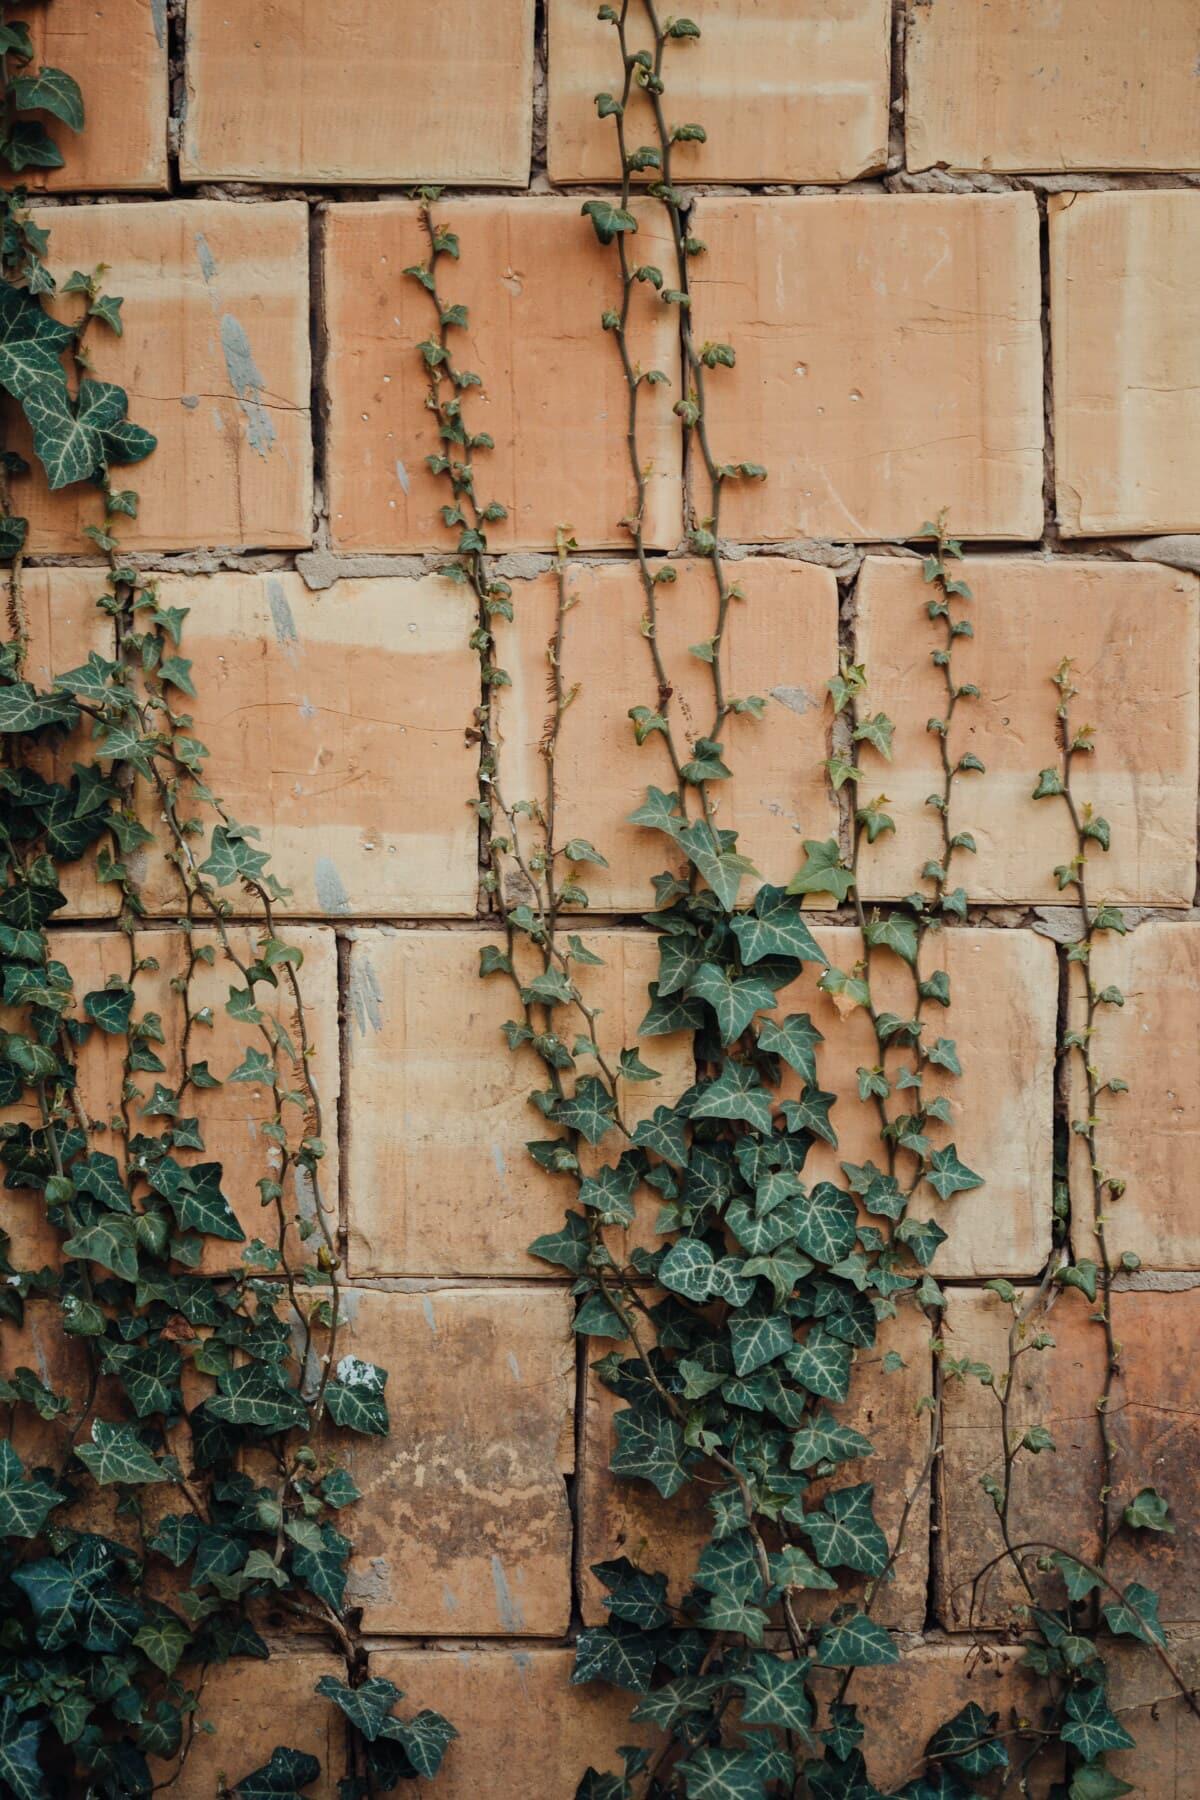 ivy, herb, leaves, wall, texture, masonry, dirty, padlock, grunge, lock